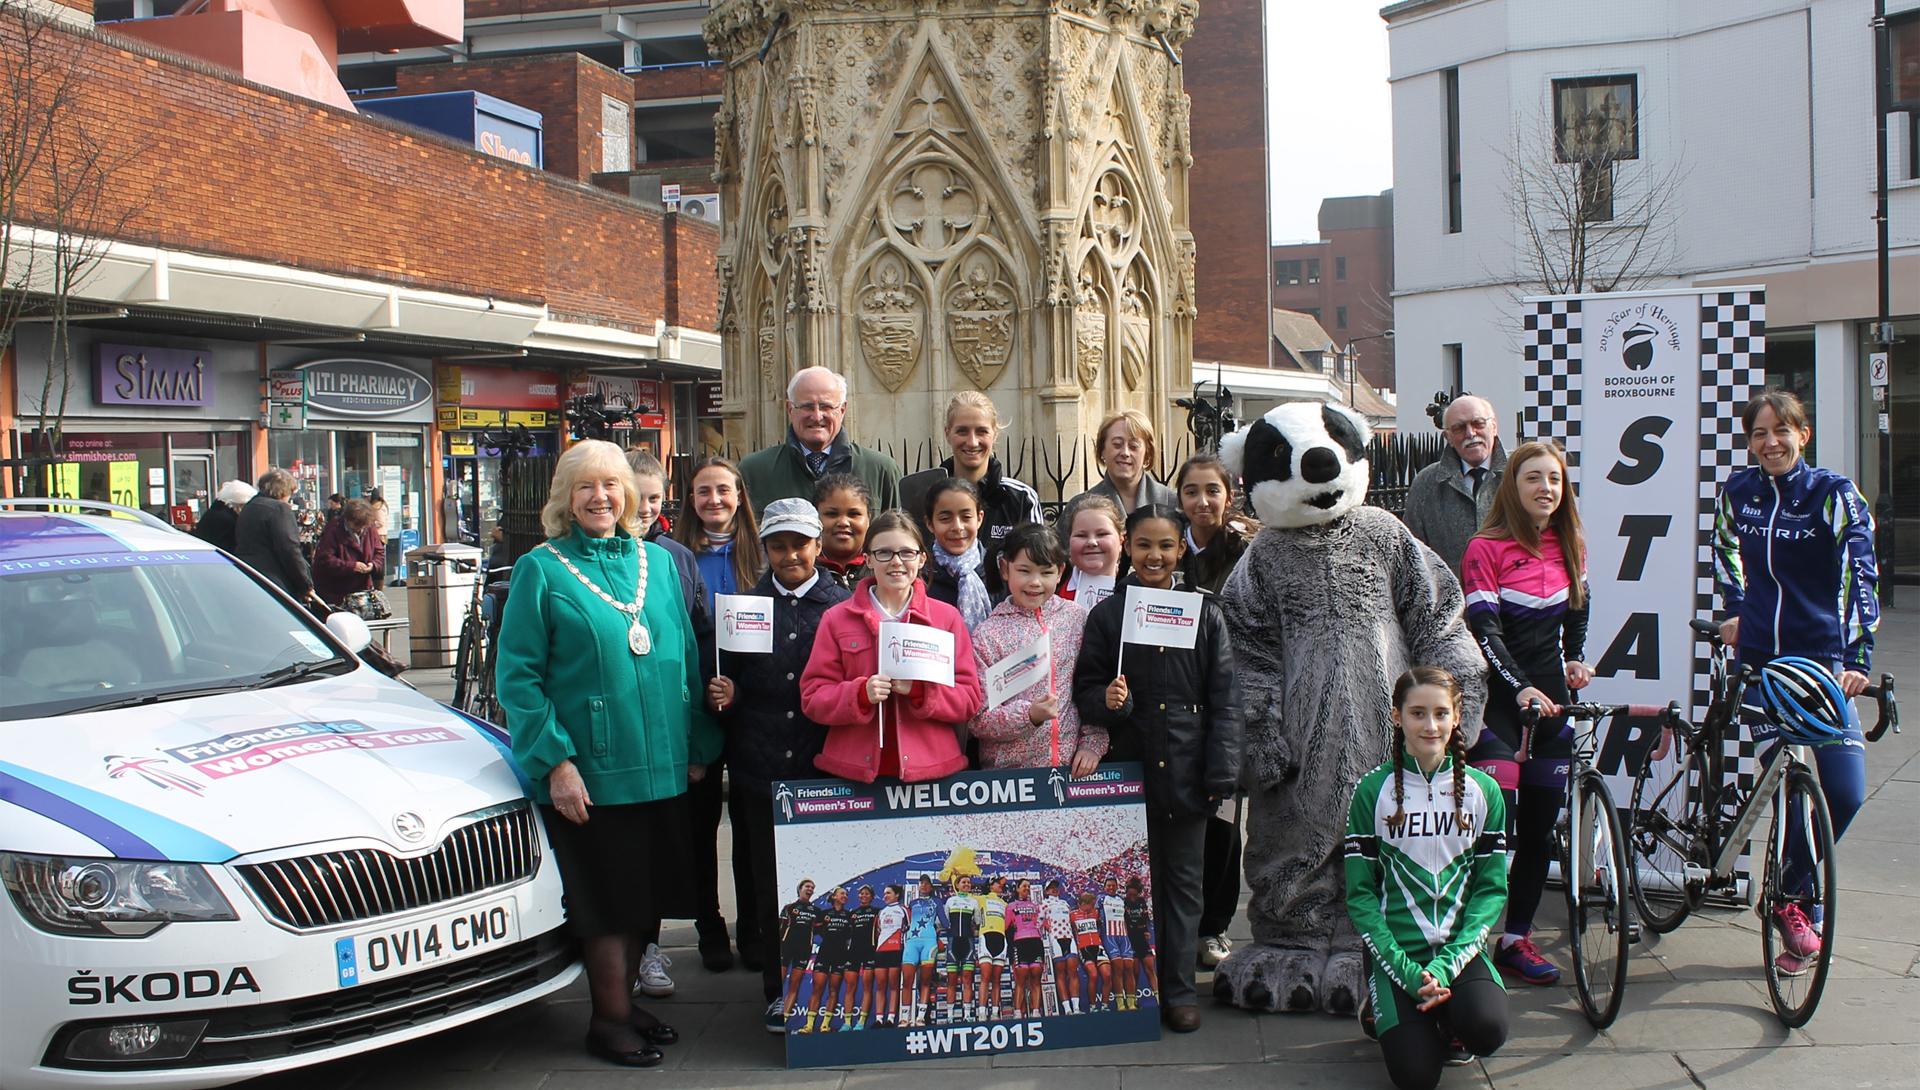 Broxbourne & Stevenage celebrate return of the Friends Life Women's Tour this June